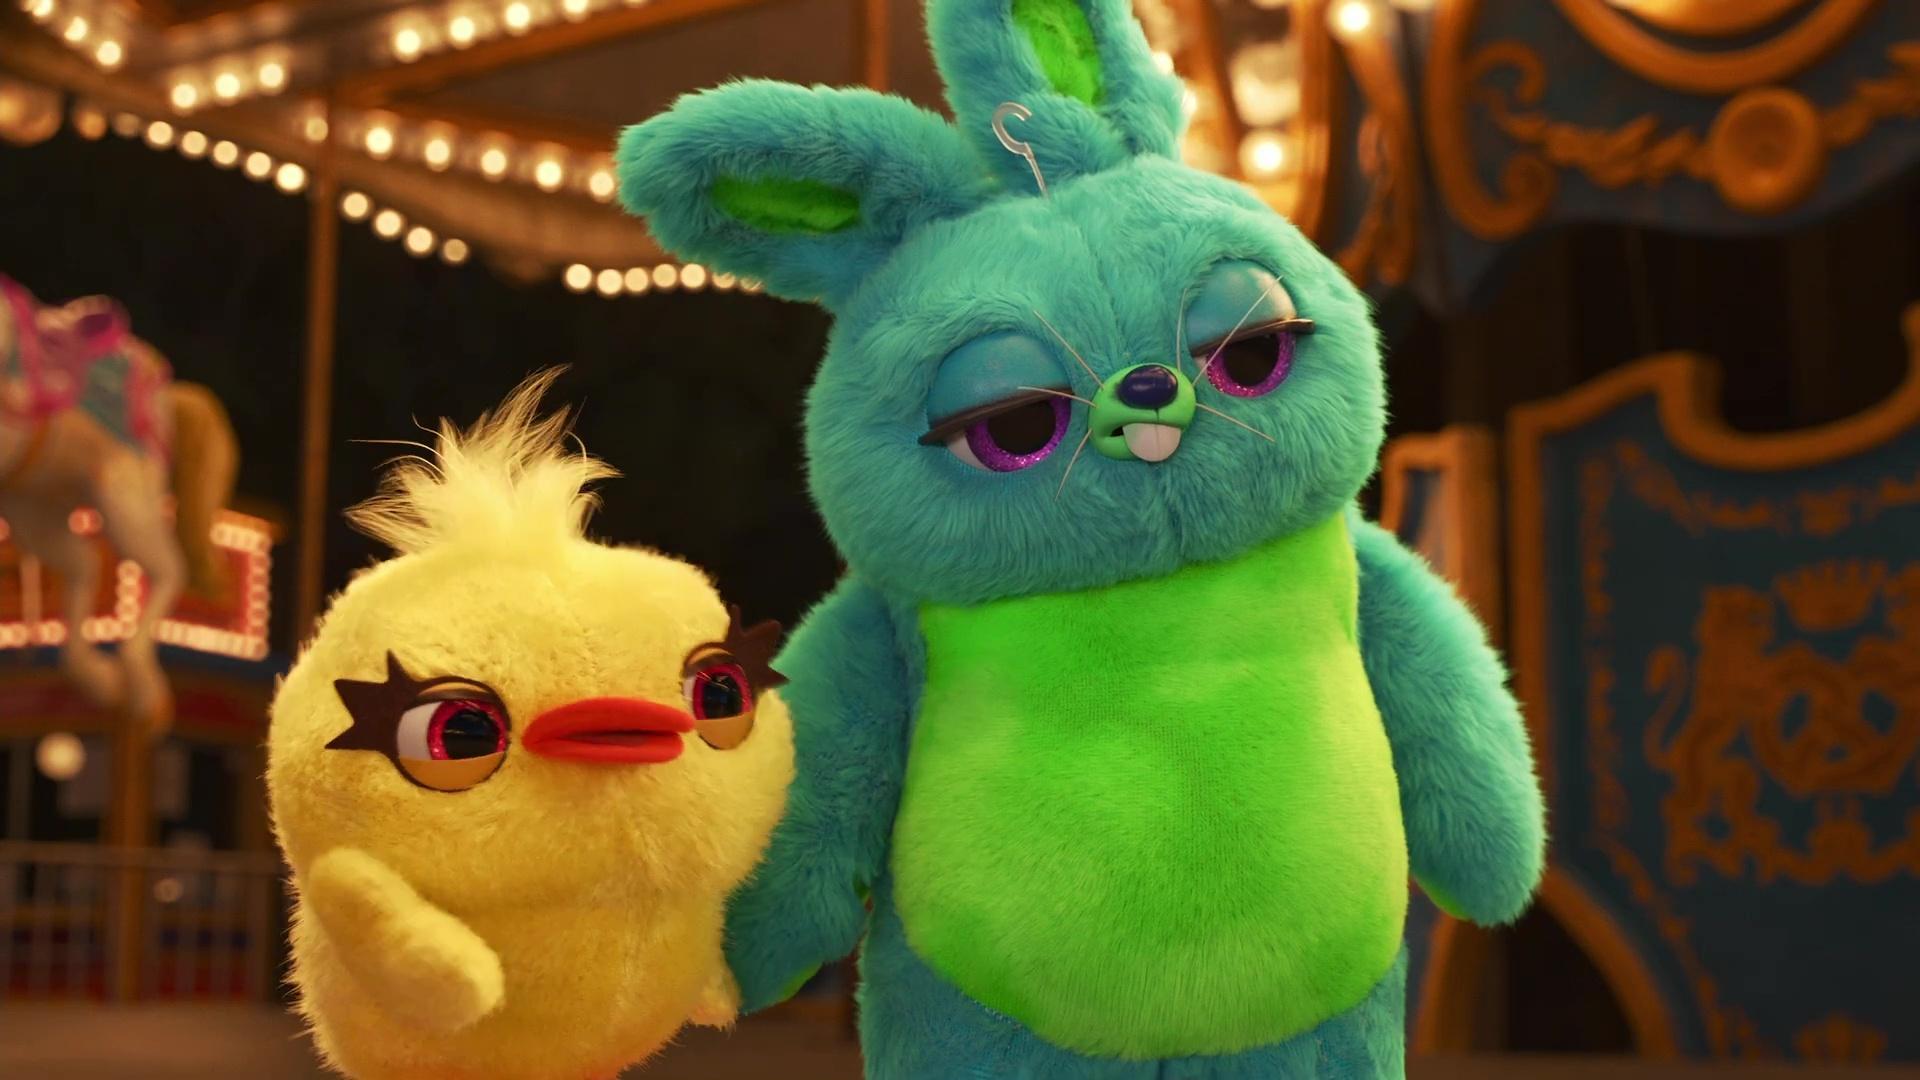 image fluffy stuff ducky bunny pixar popcorn disney